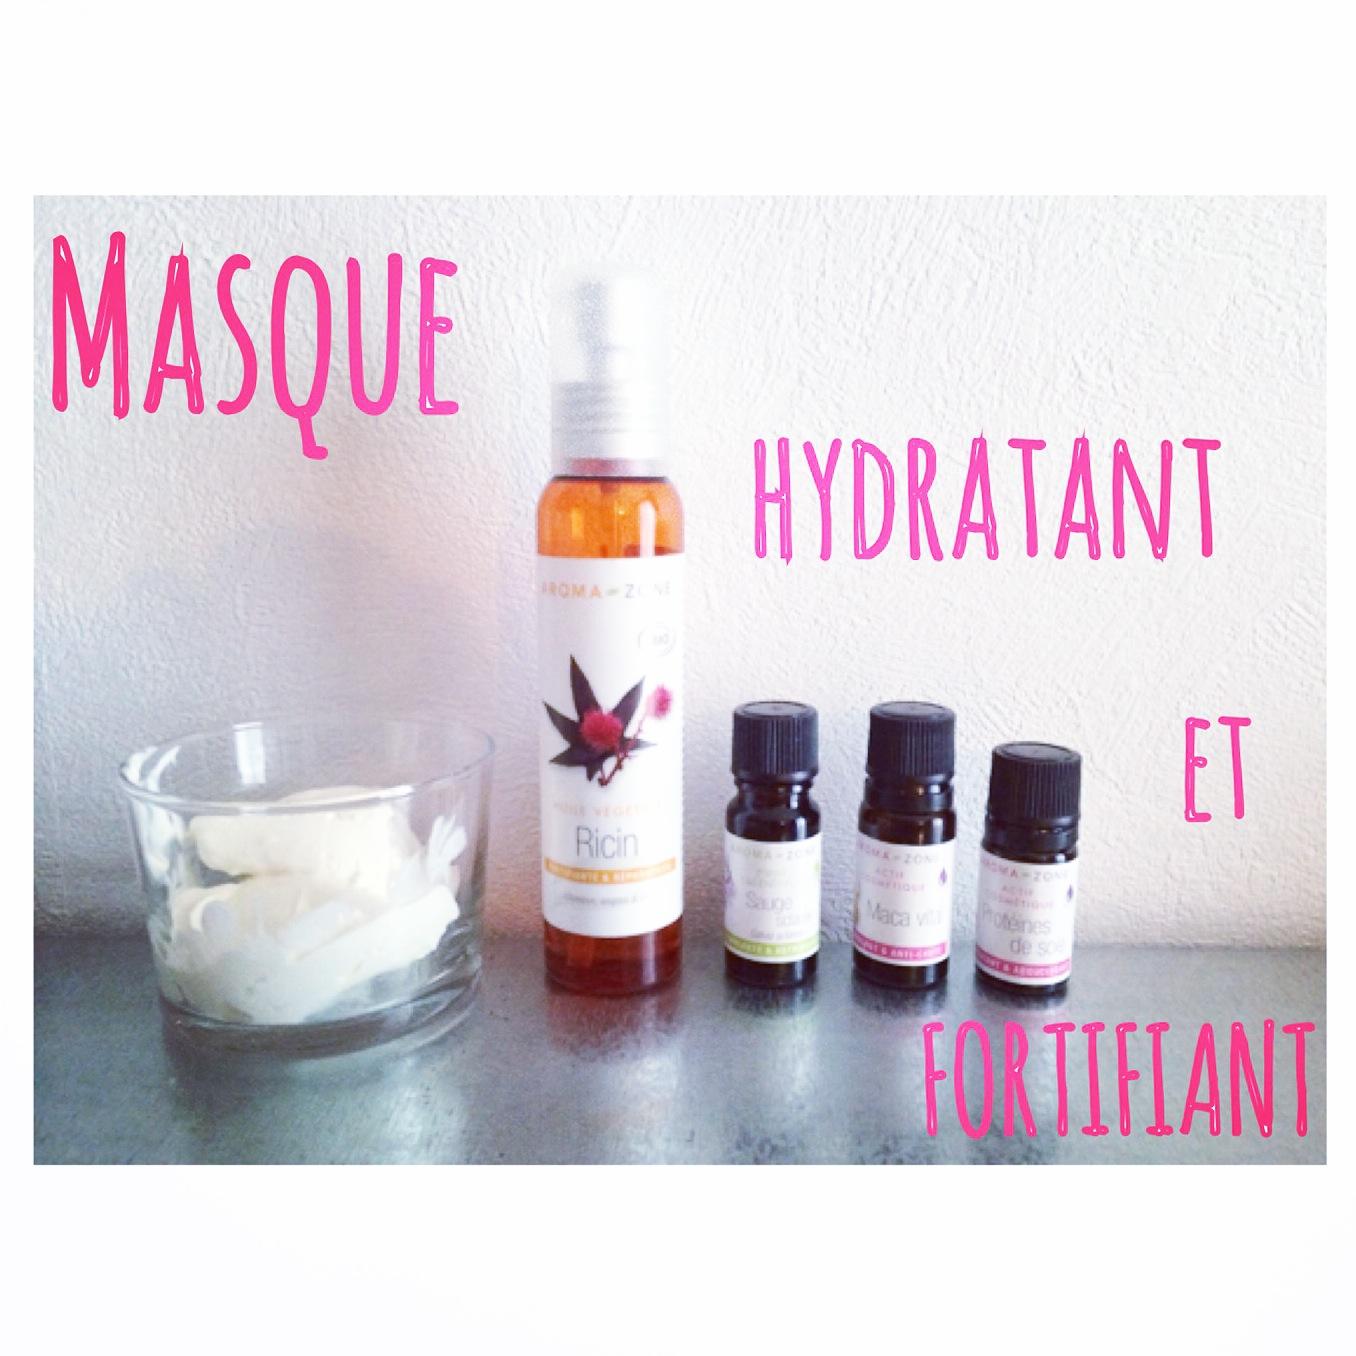 masque hydratant et fortifiant peau neuve. Black Bedroom Furniture Sets. Home Design Ideas